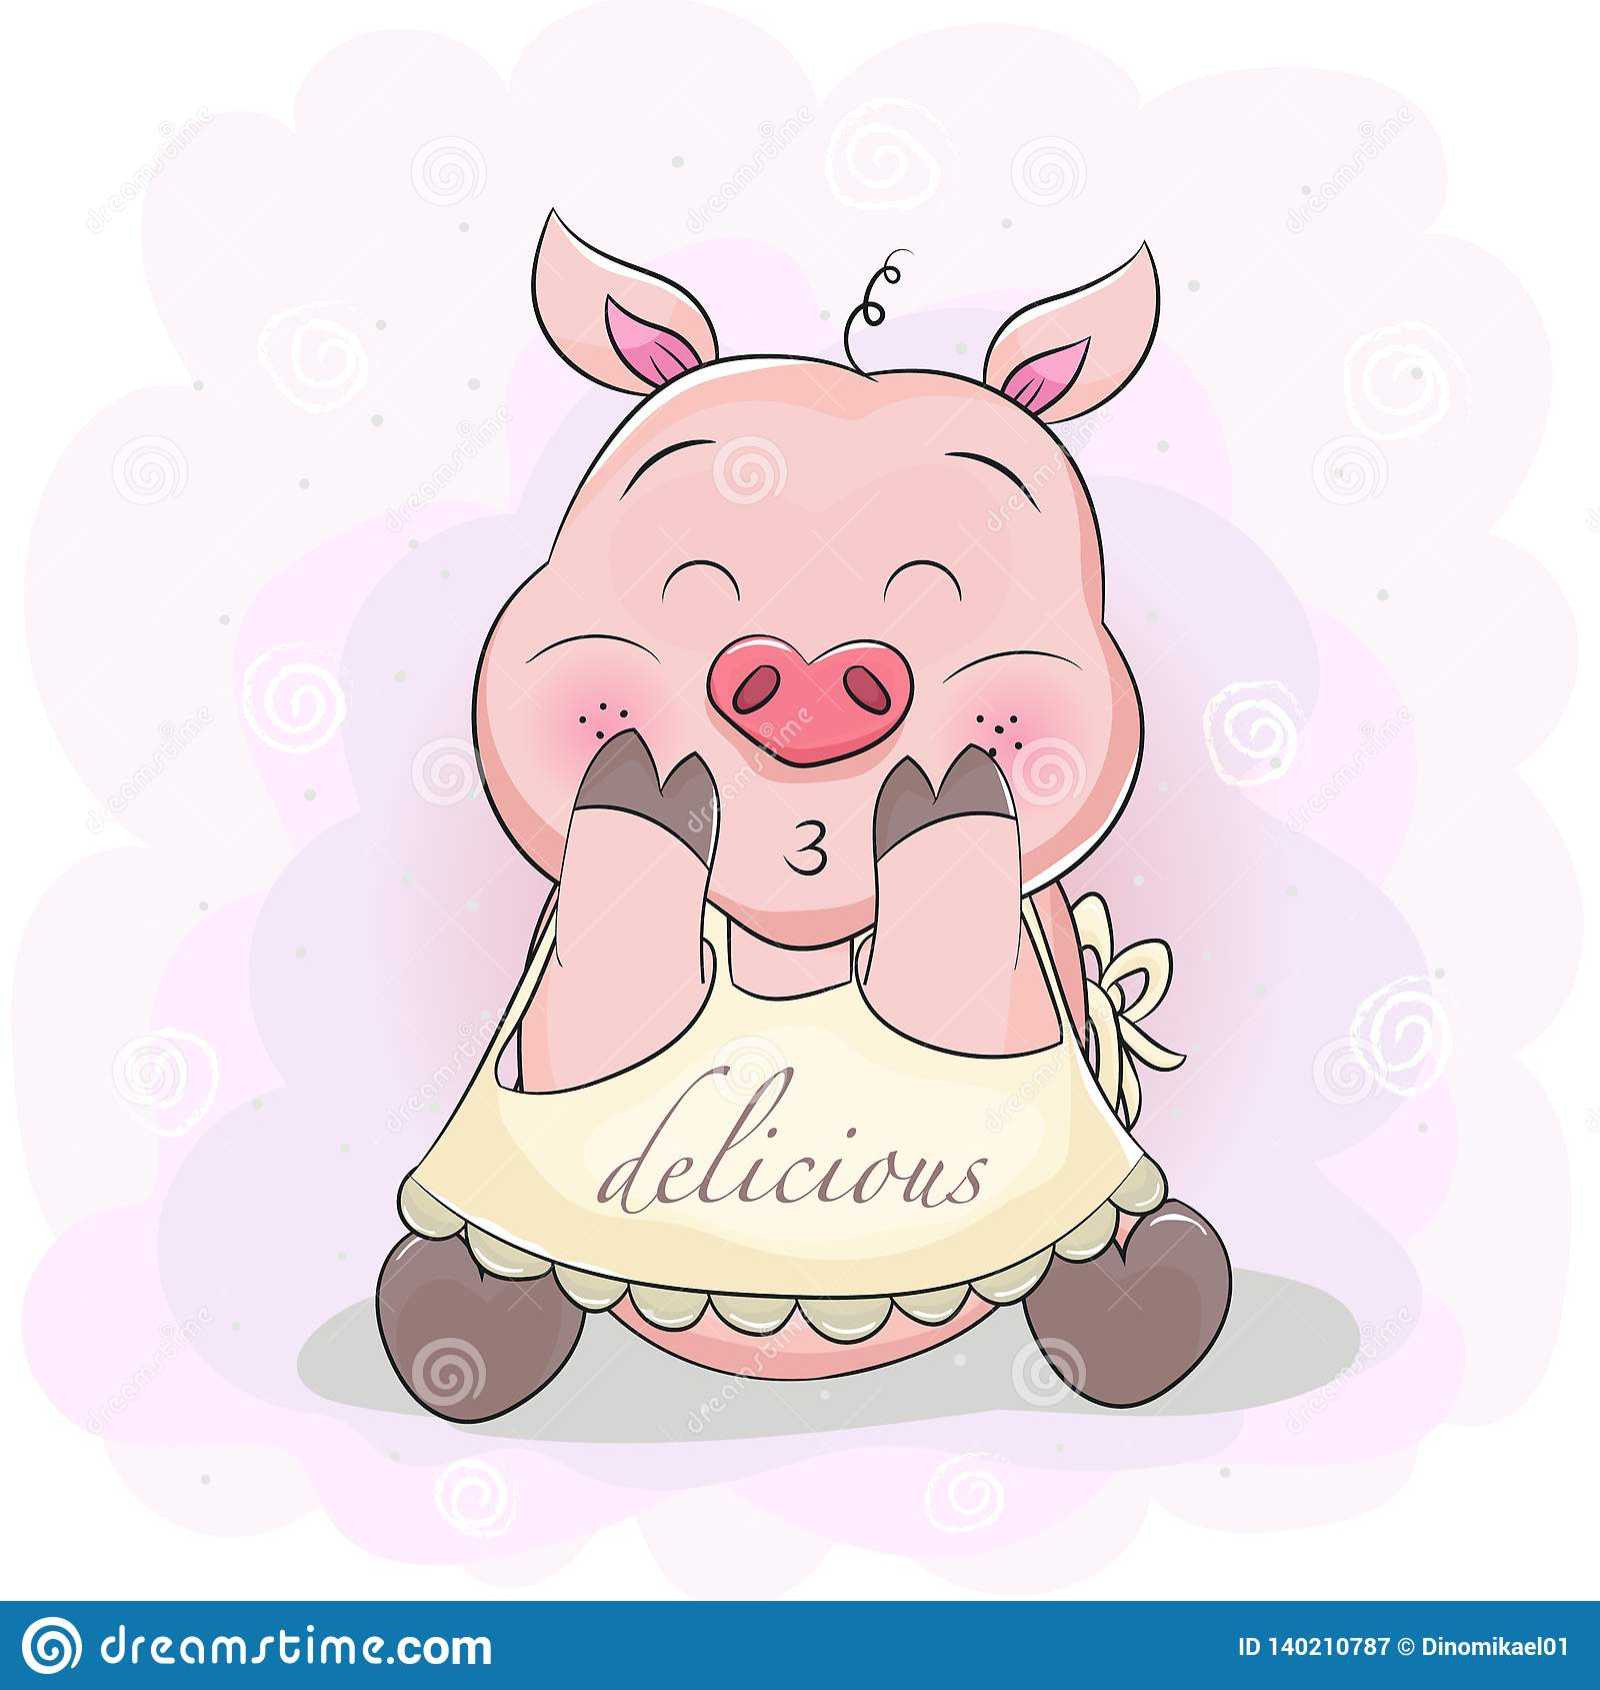 Cute cartoon pig with apron